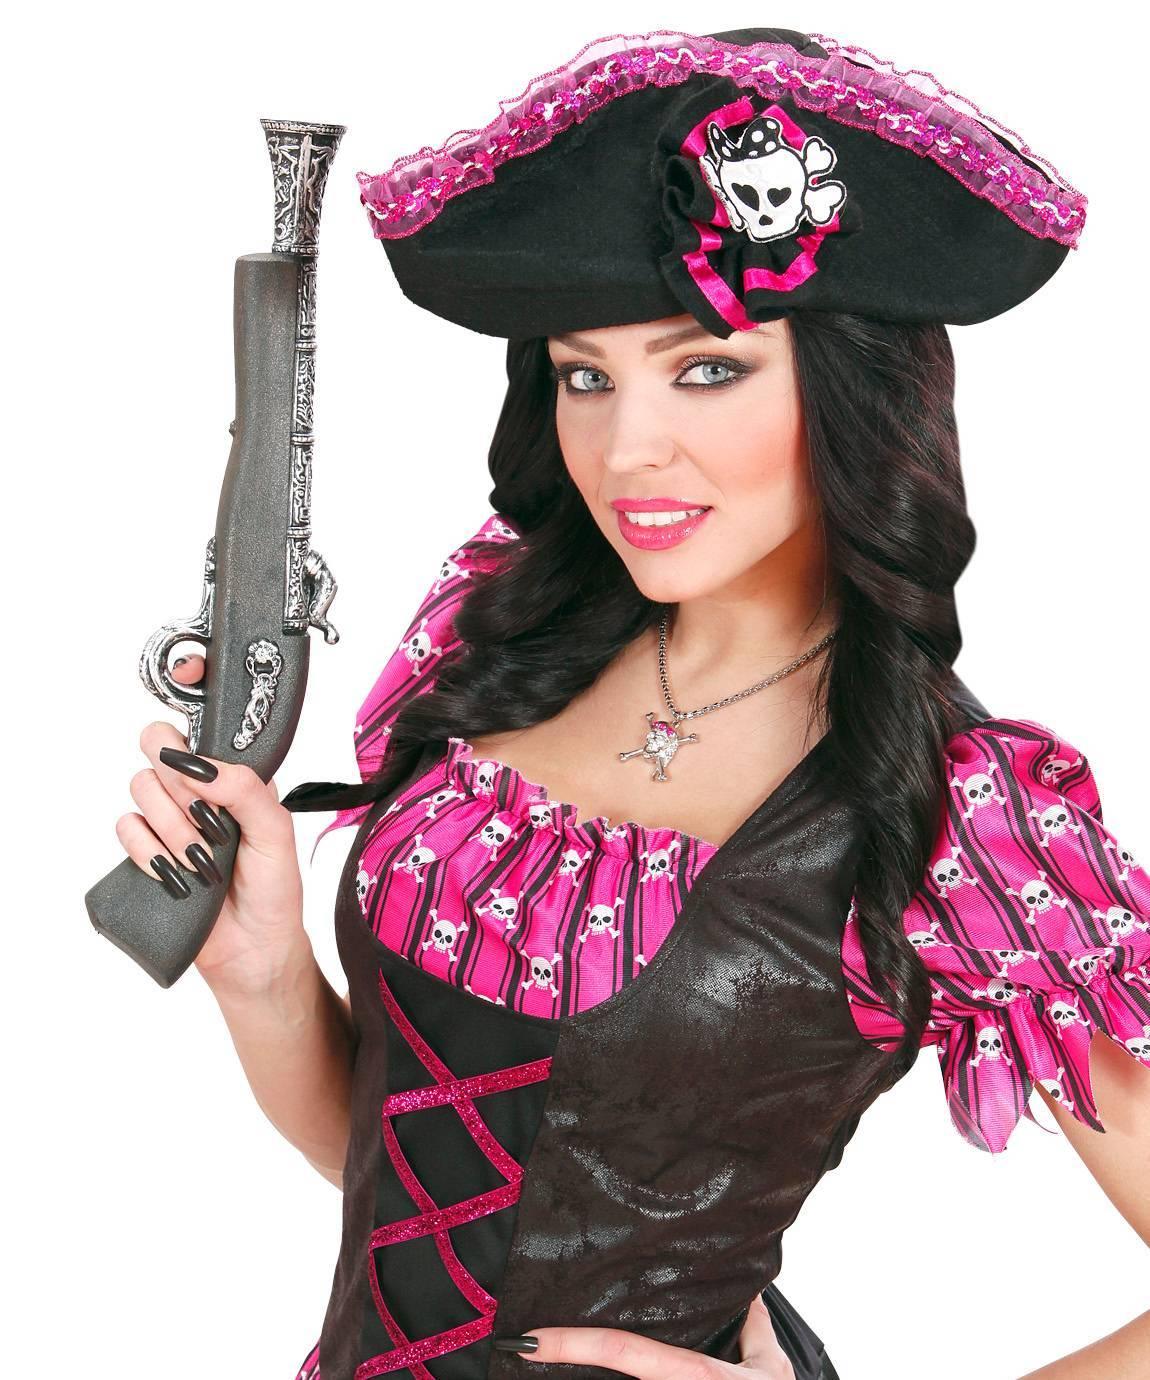 Pistolet-pirate-3